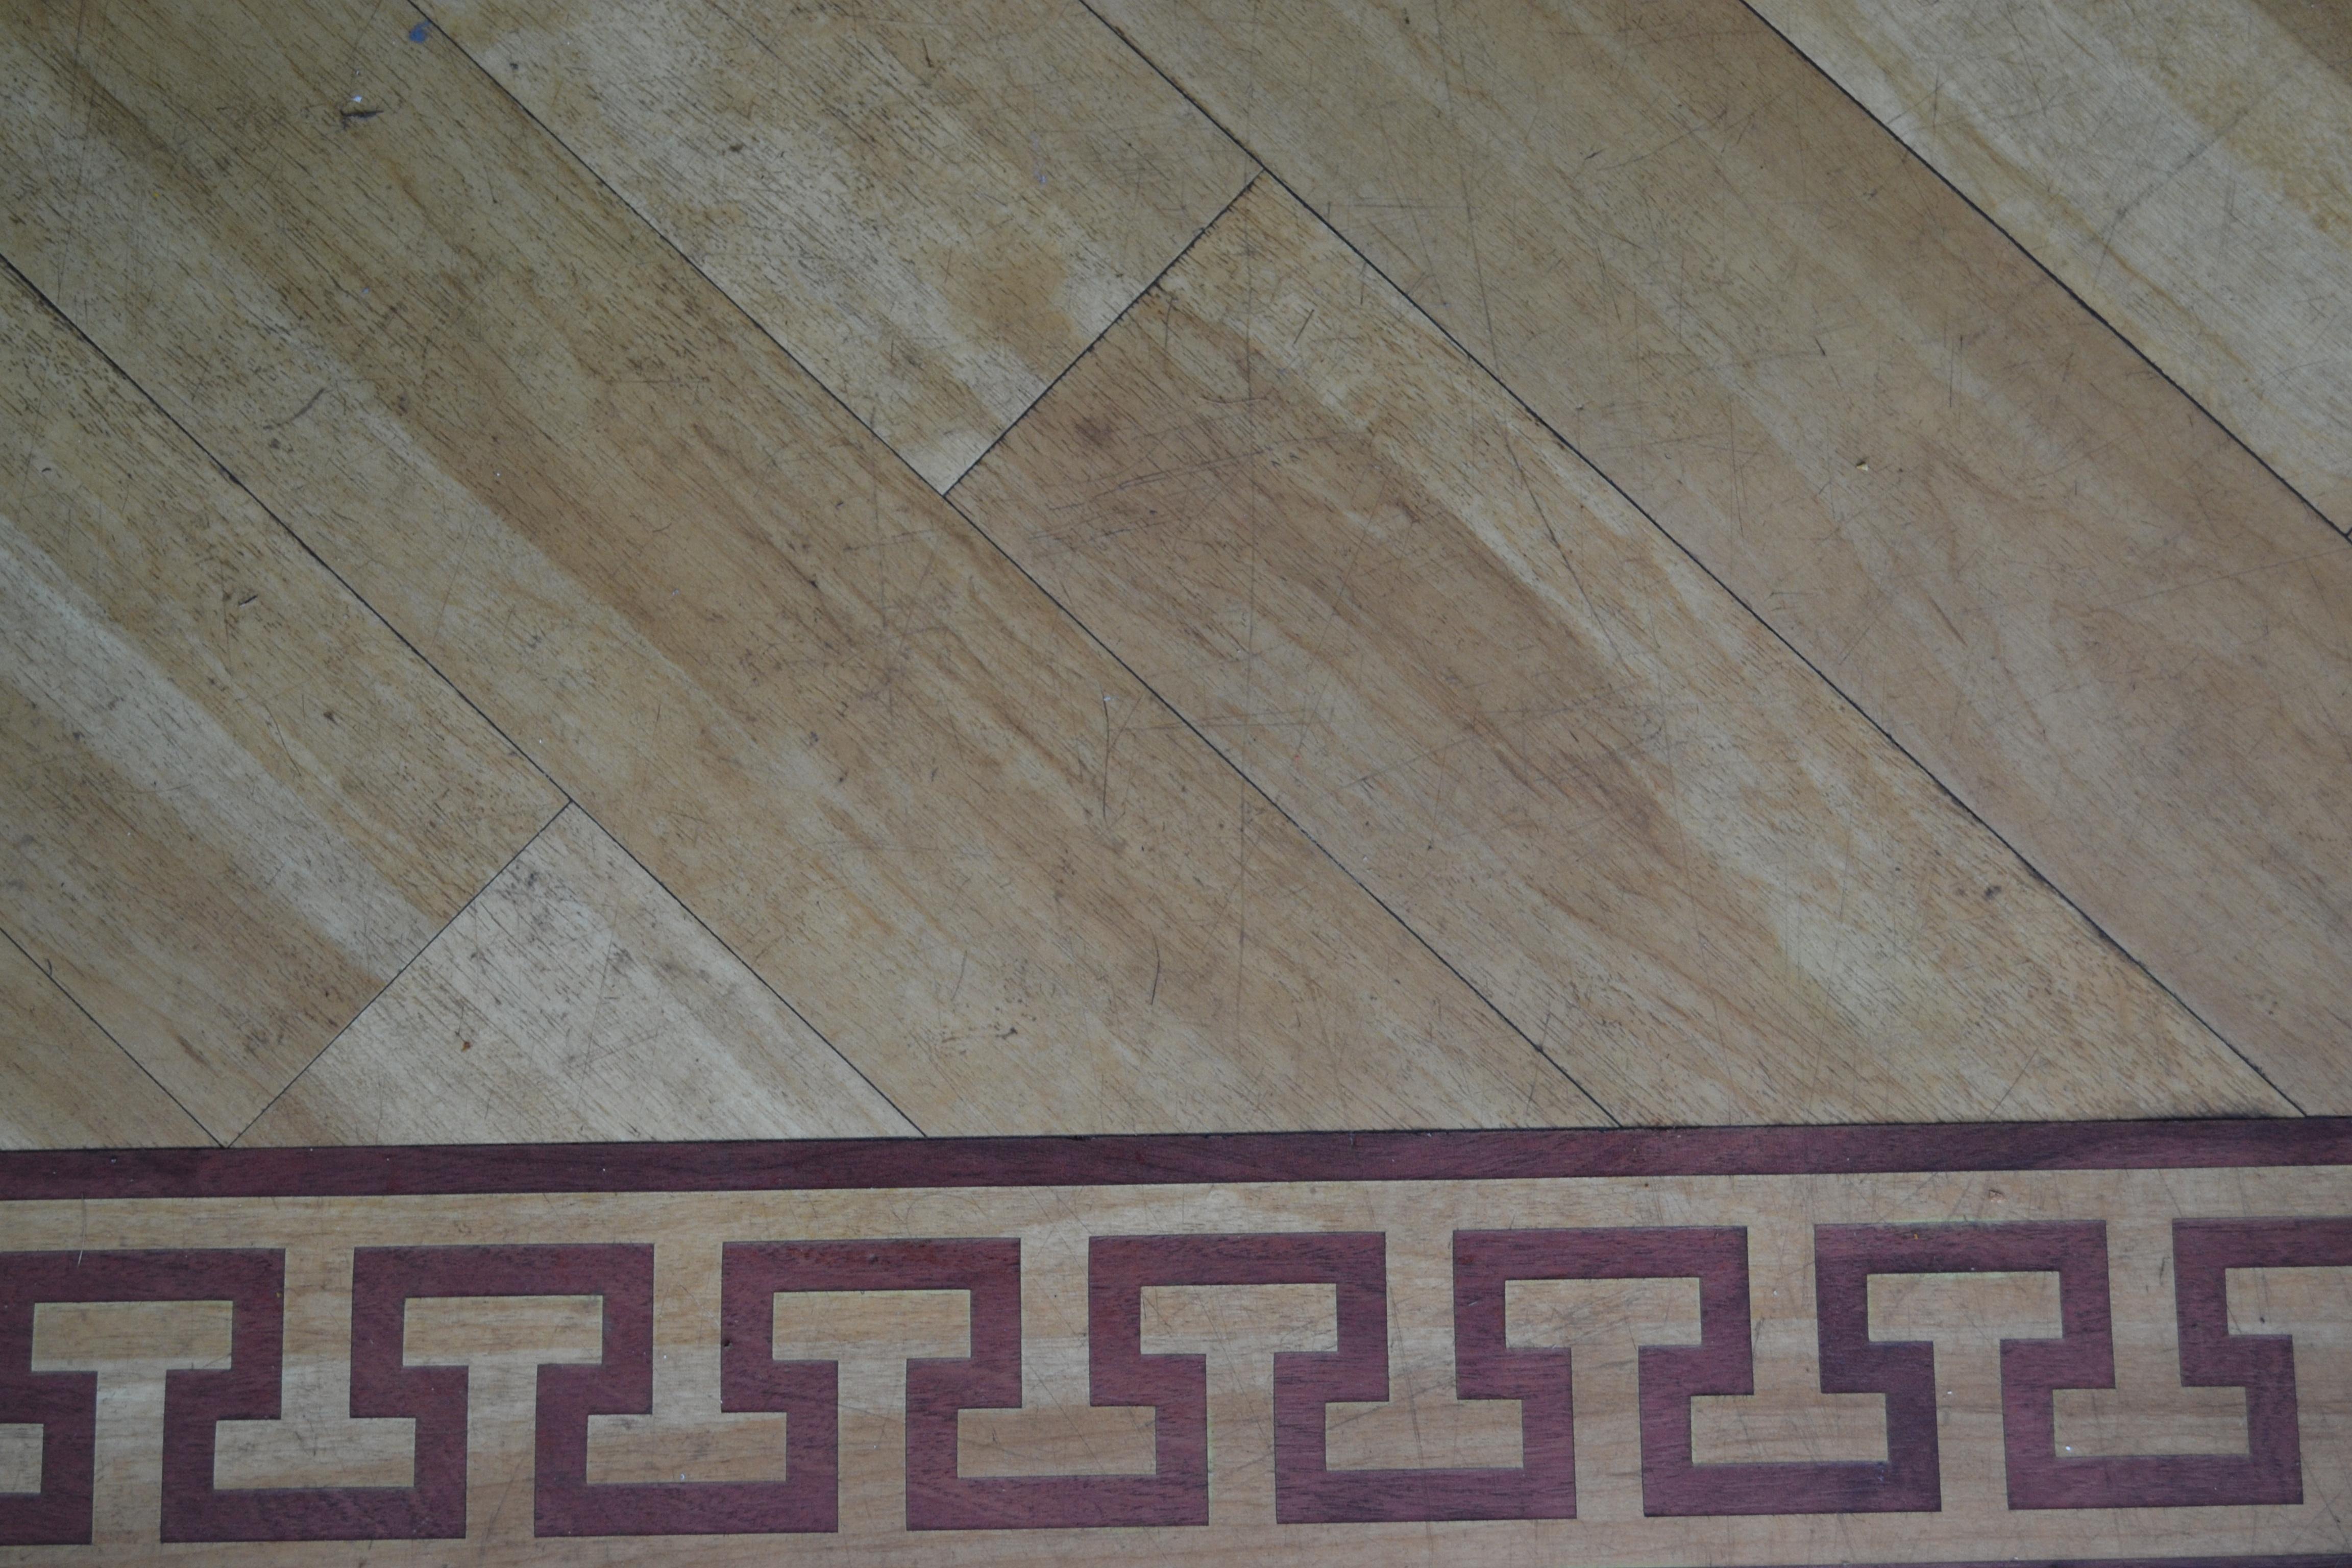 floors flooring floor with border mawson a hall karndean keyline